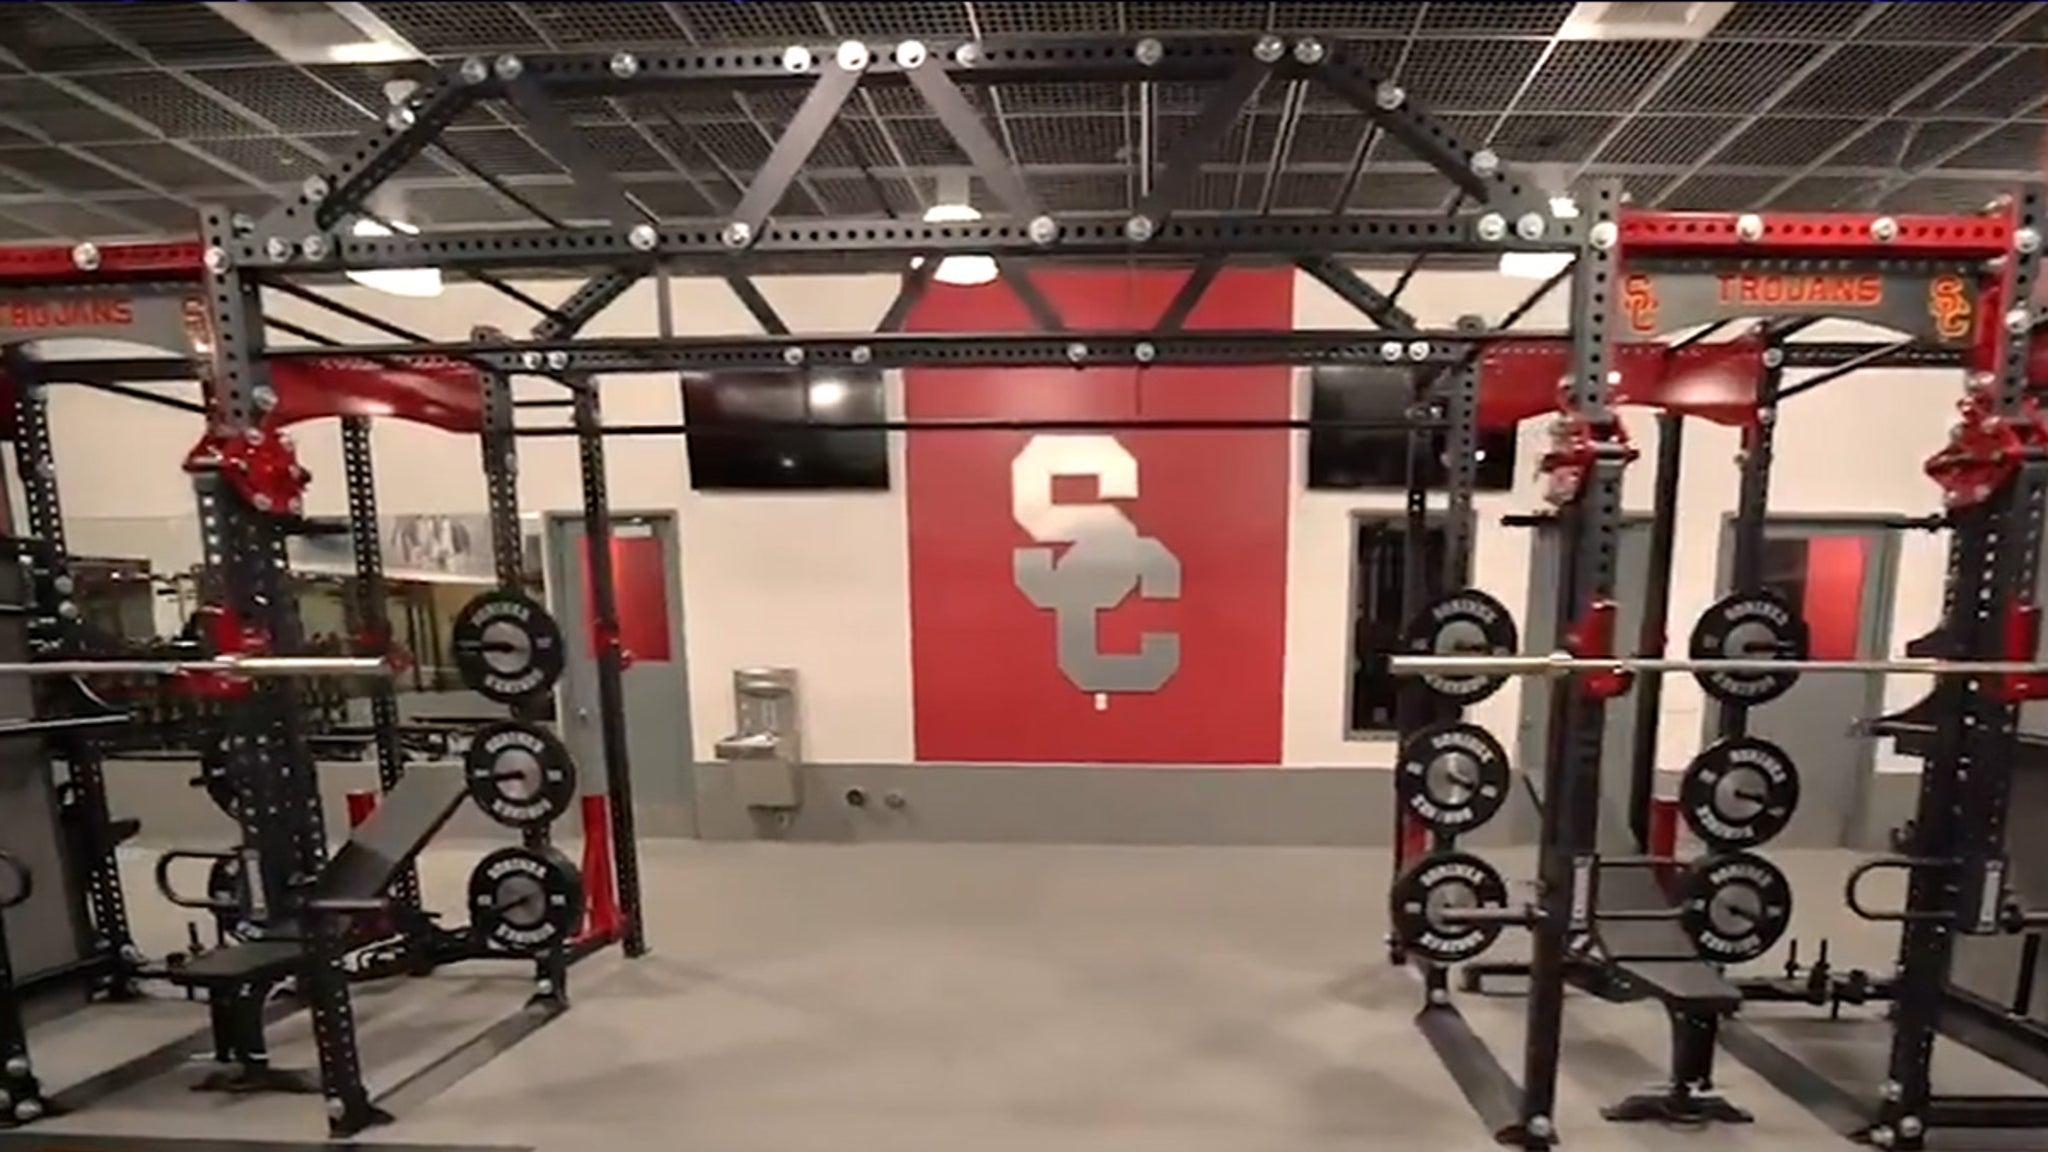 NBA's DeMar DeRozan Upgrades USC Weight Room ... With Historic Donation!!!